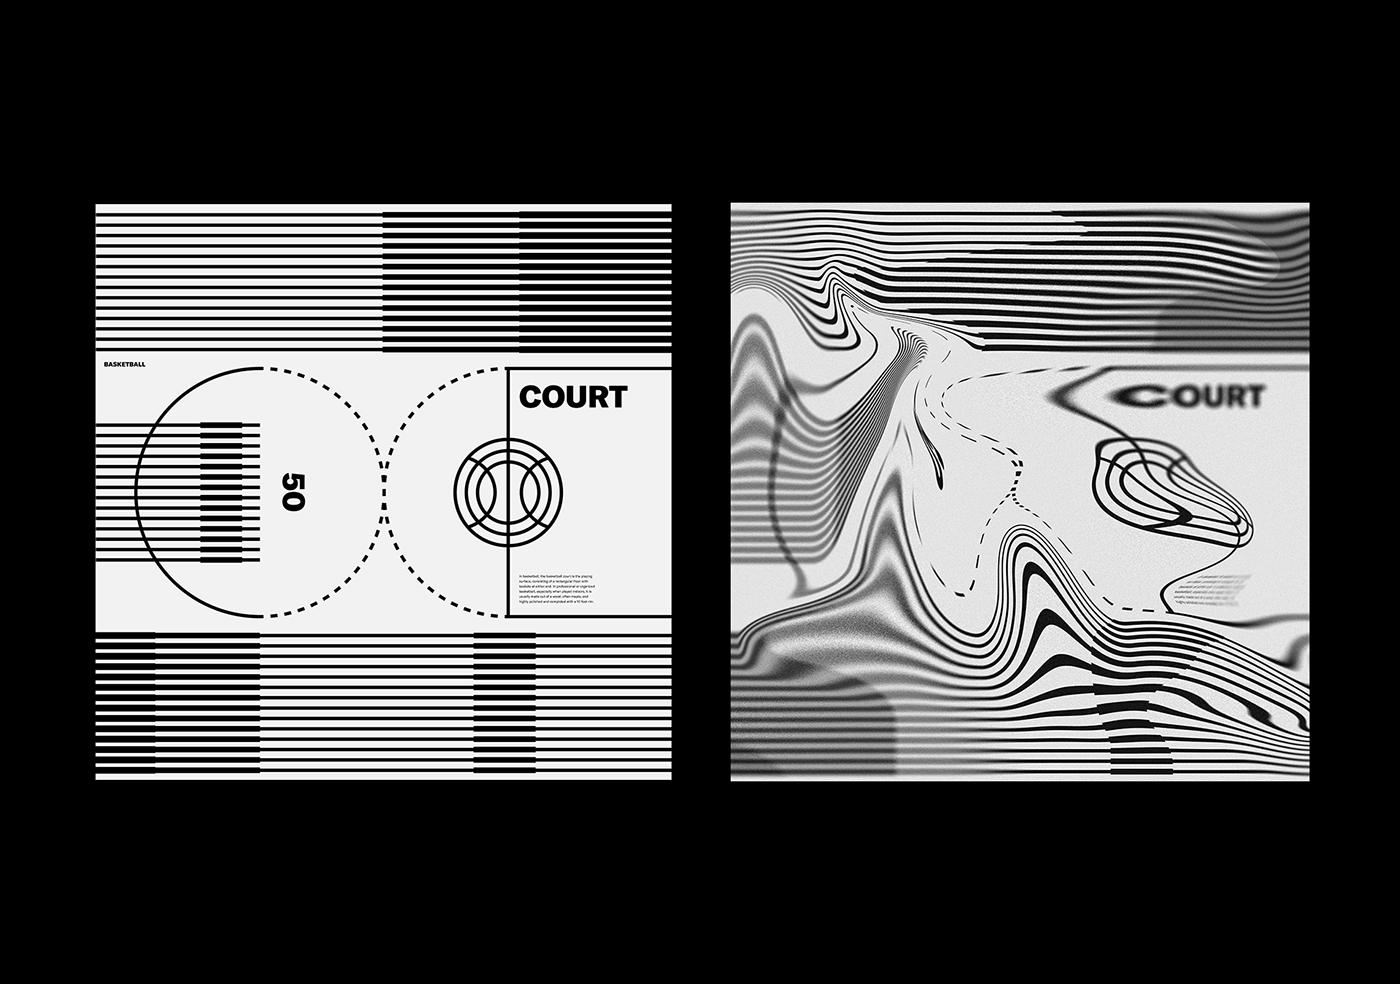 tendencias-diseno-grafico-2020-basketball-1